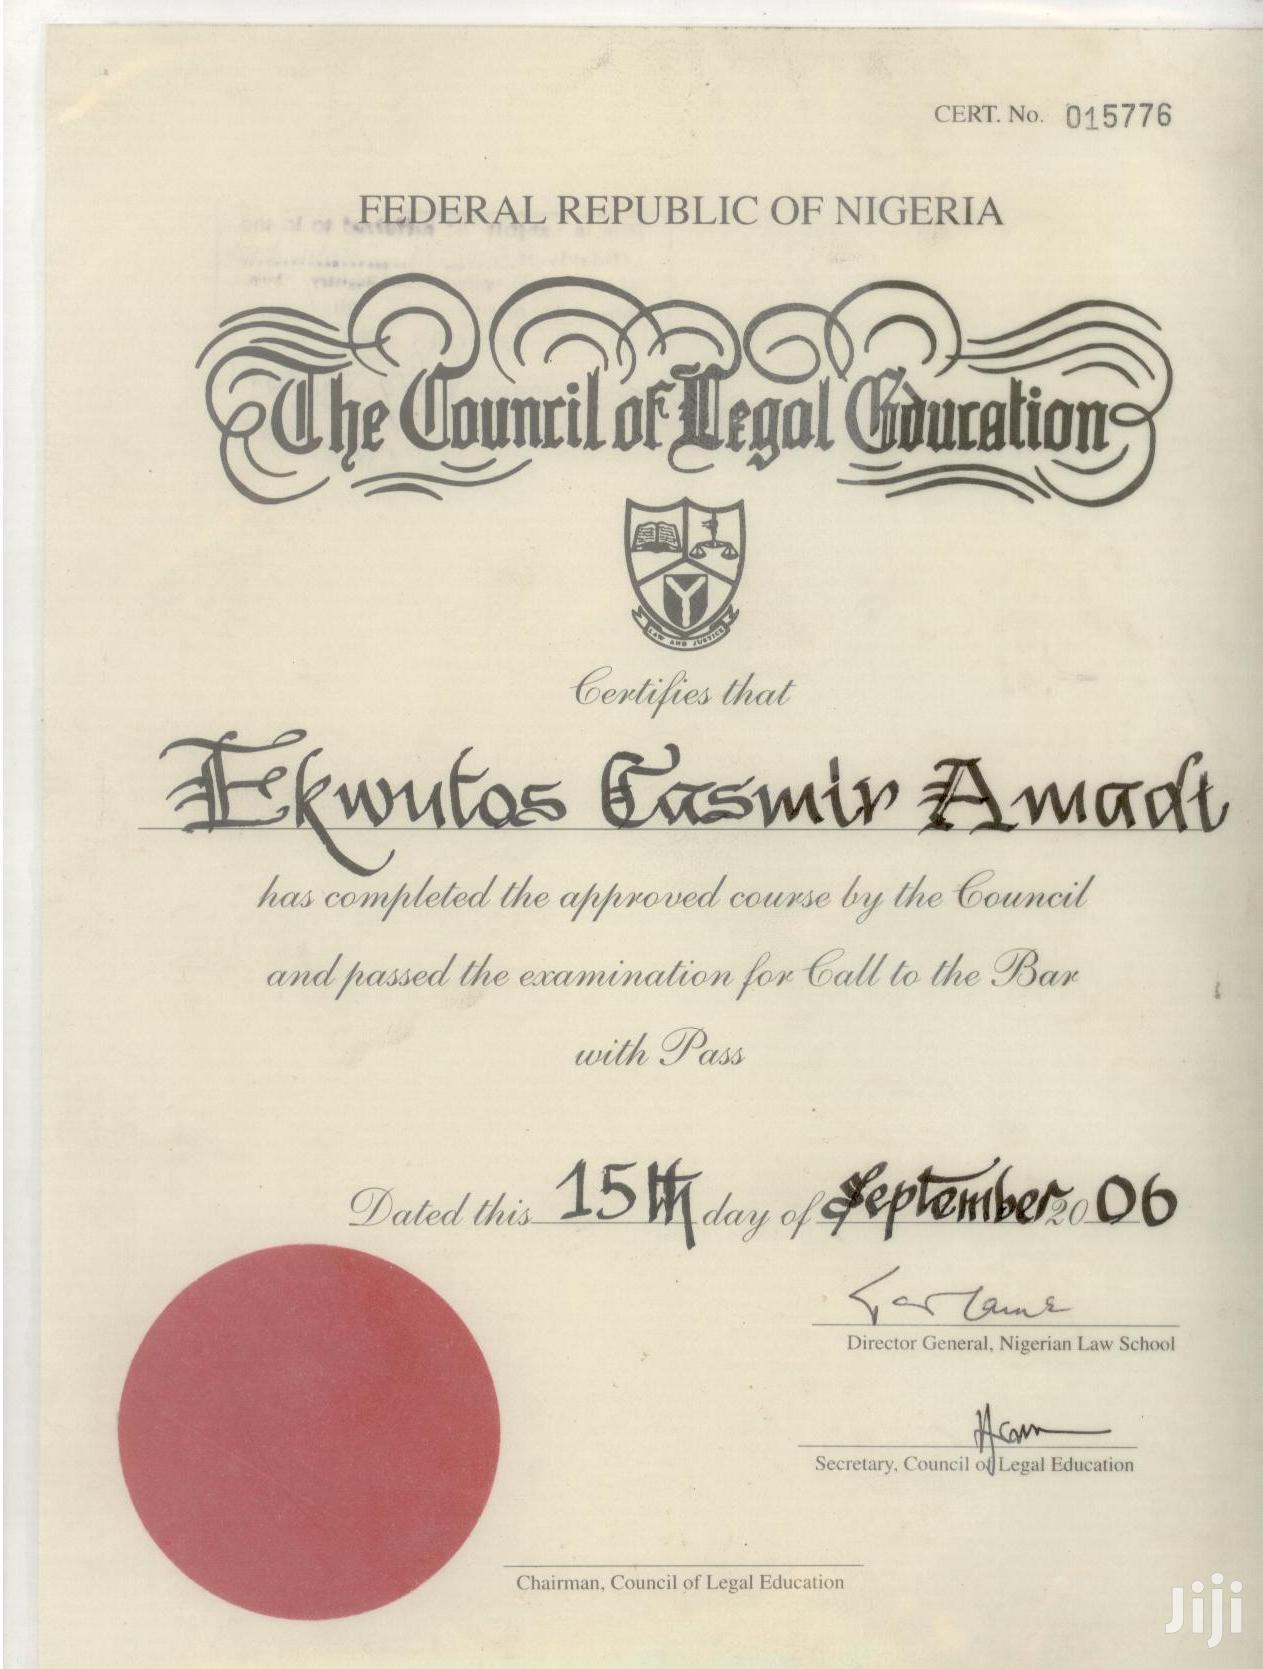 Legal Adviser/Company Secretary